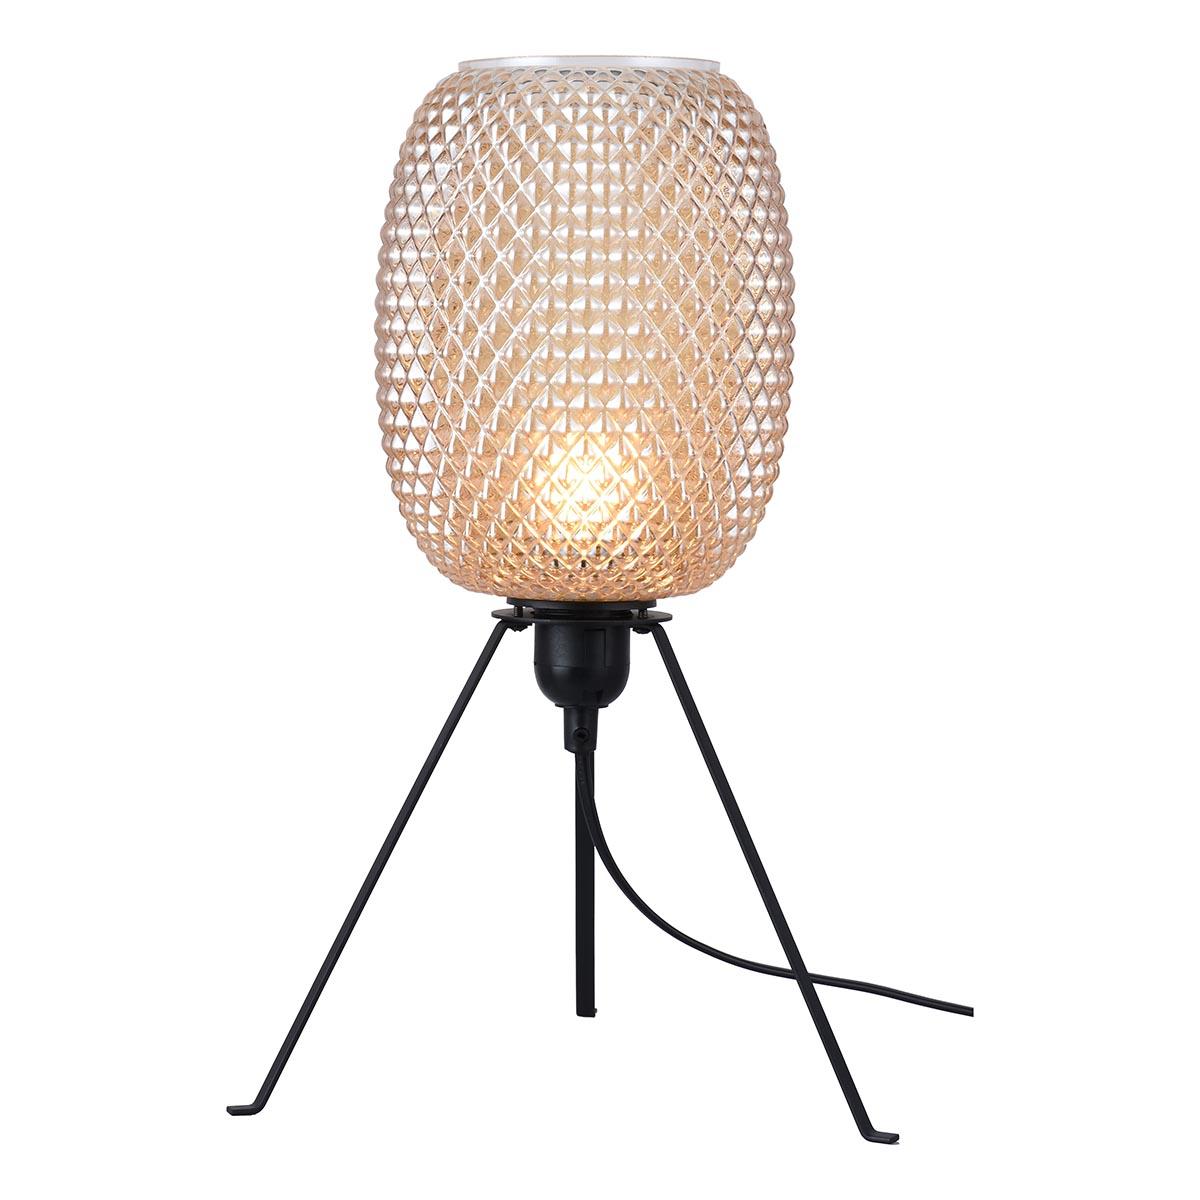 Настольная лампа Toplight TL1210T-01BL Alice бра toplight donna tl7510b 01bl